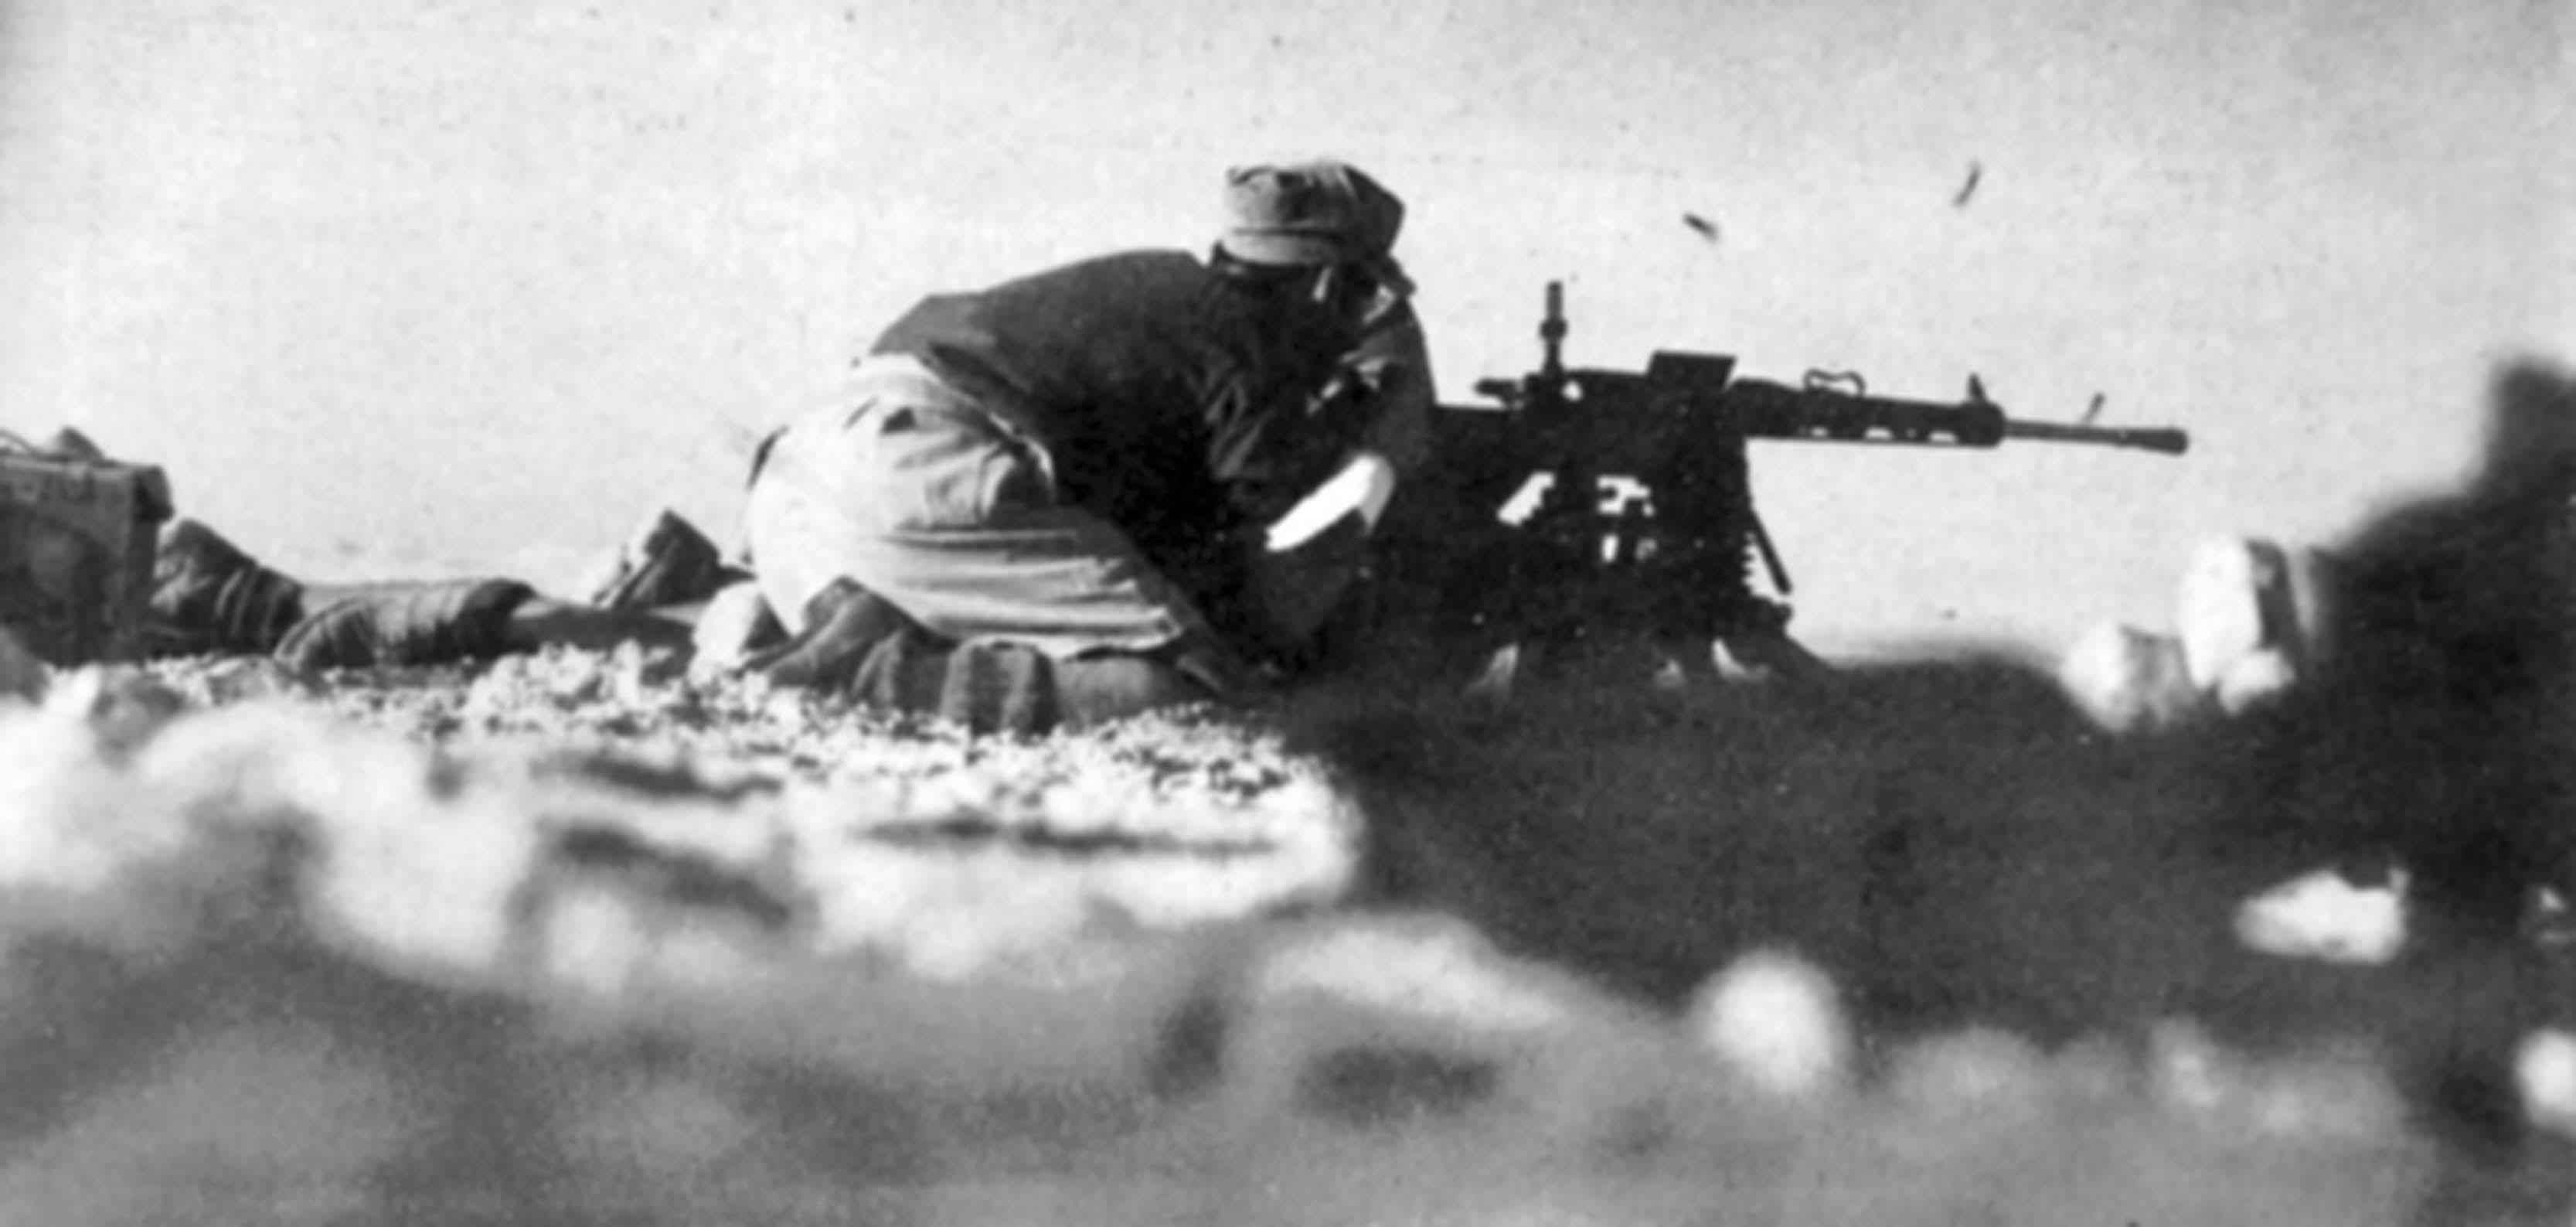 FIAT-Revelli machine gun